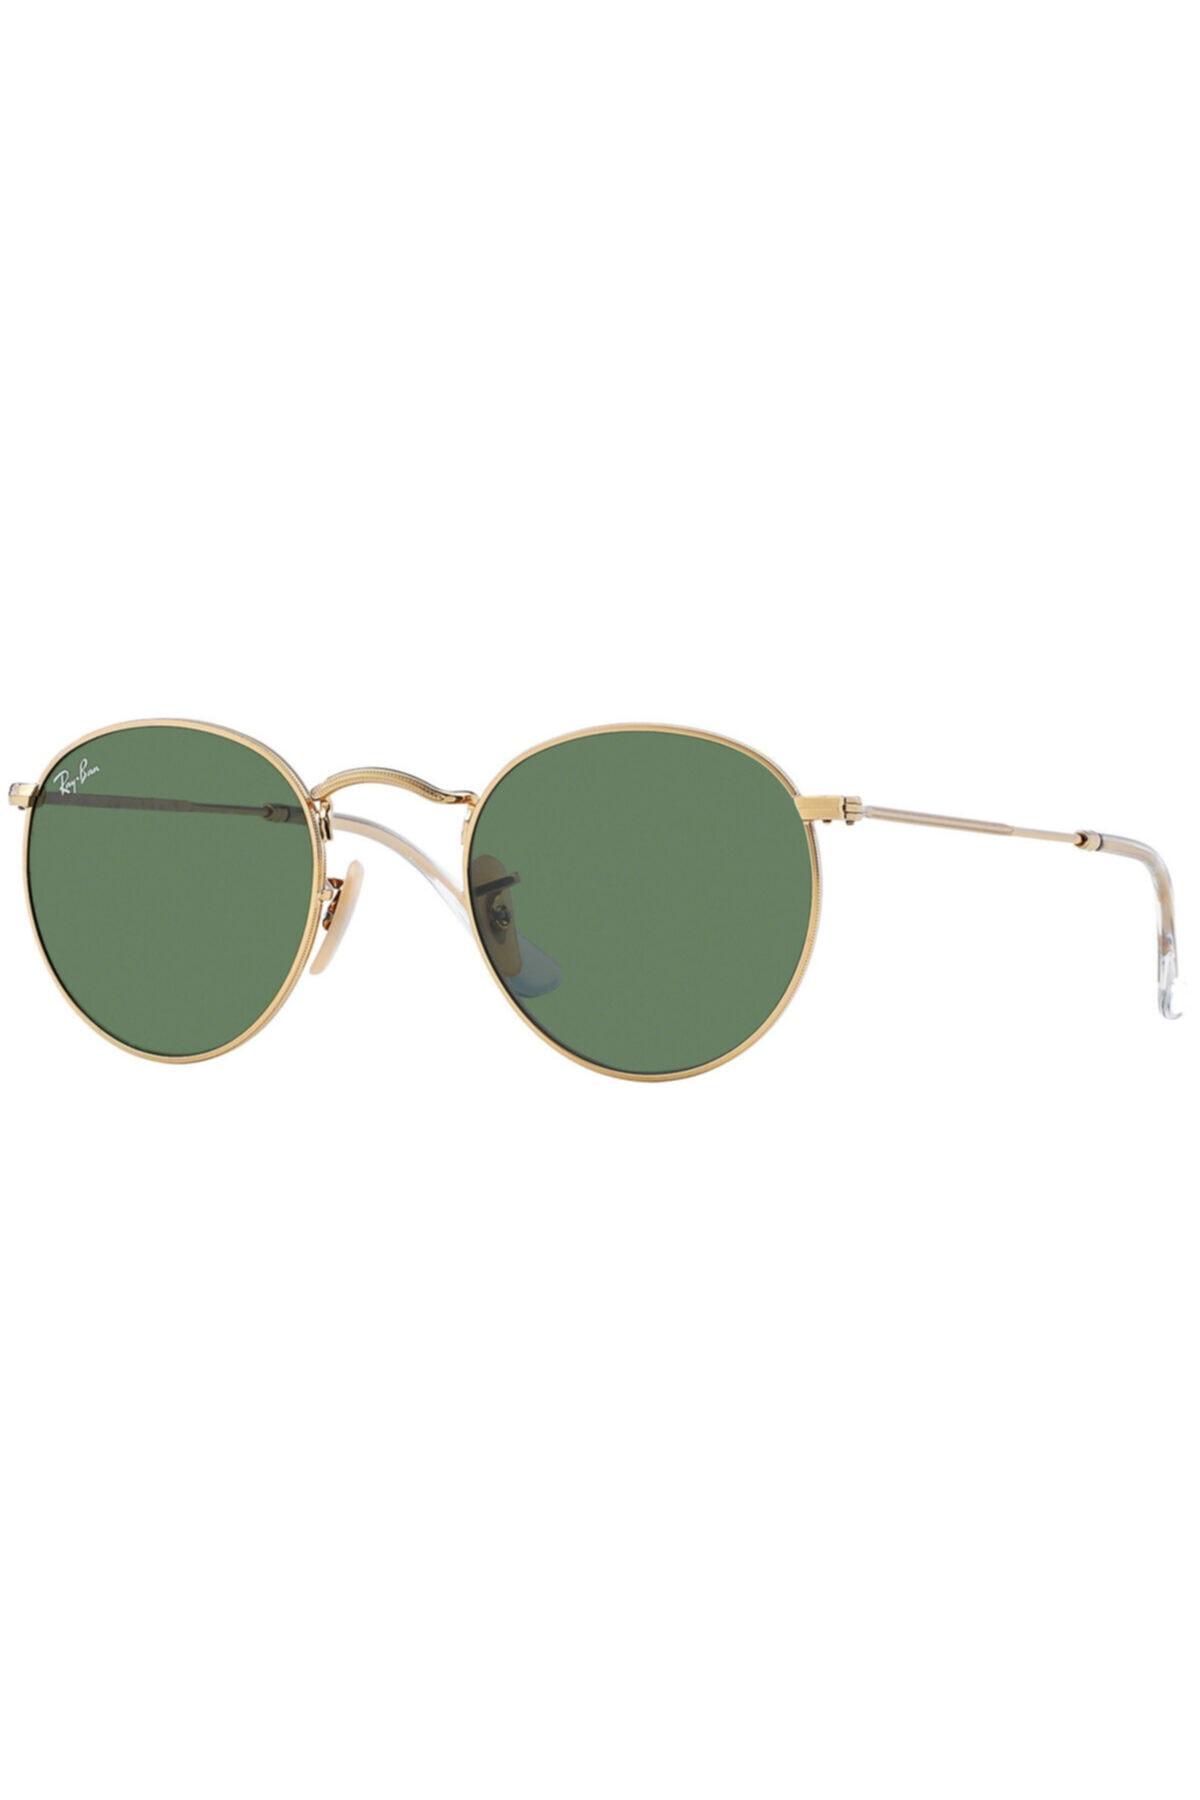 Original Rayban Women's 2021 New Season Sunglasses 001-50